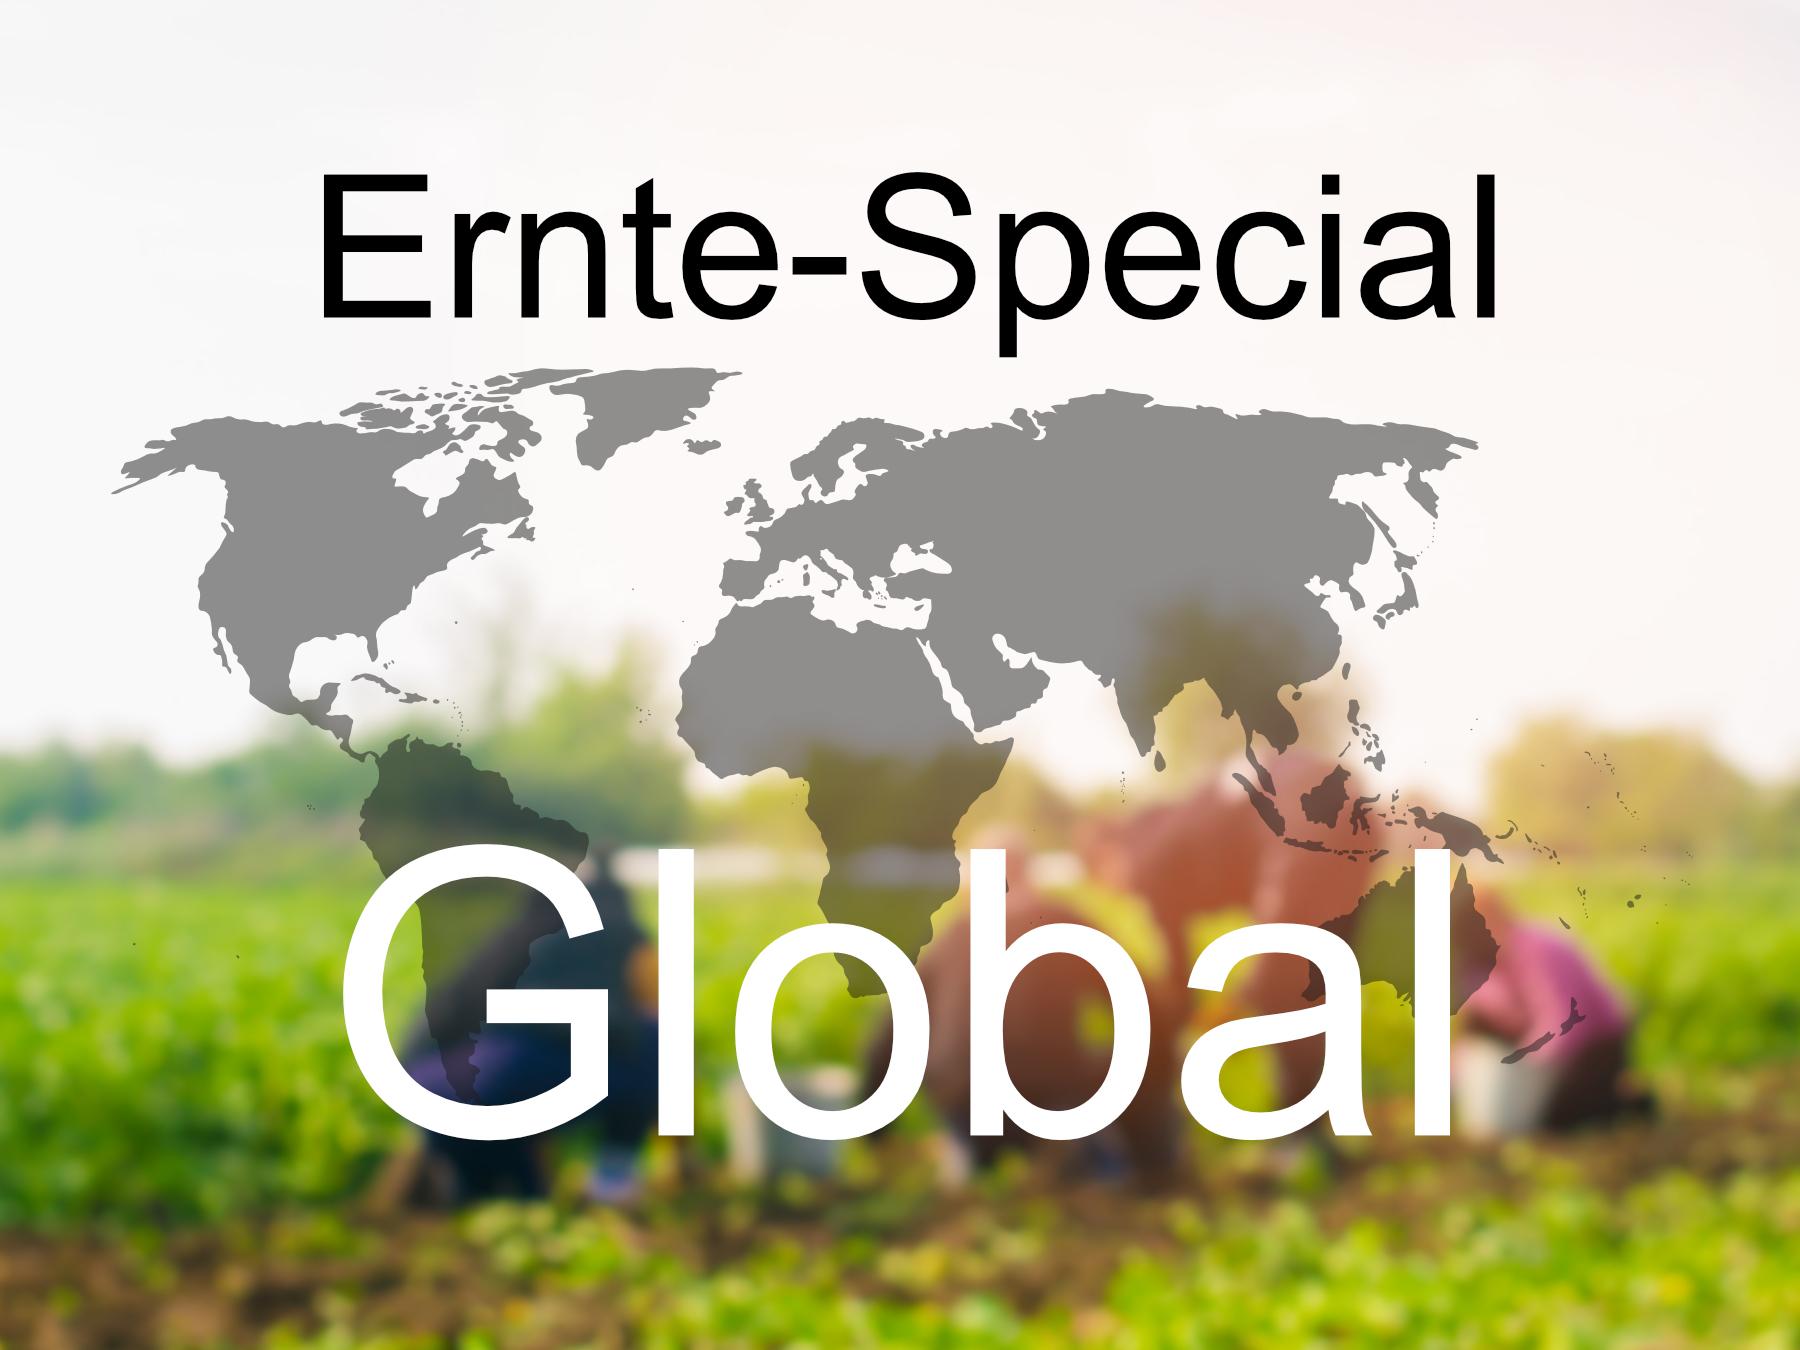 Blog-Bild-Ernte-Special-Global